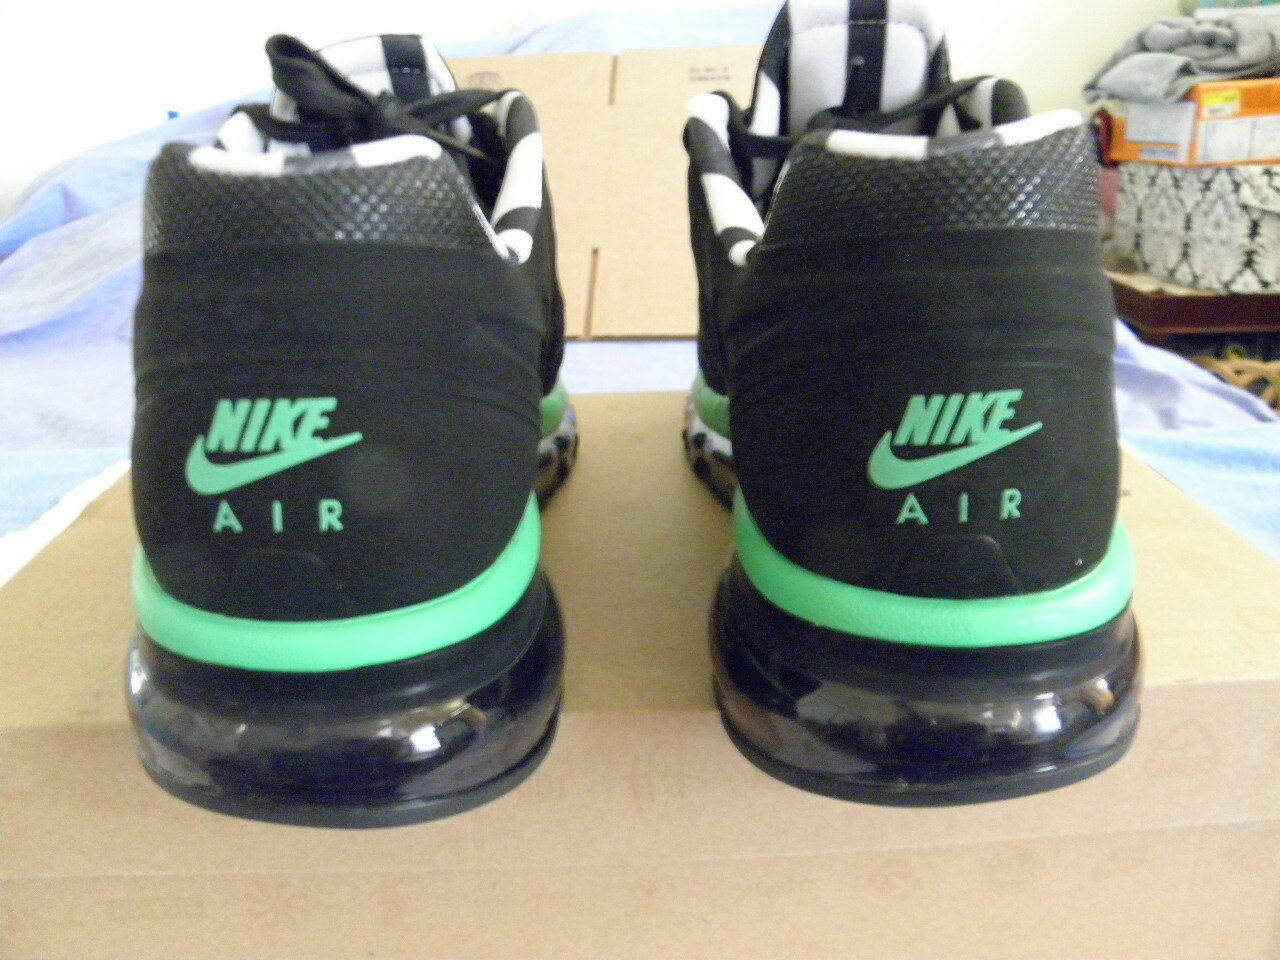 Nike Air Max 2013 Paris France sz 11 Worn PADS ONCE Pass as DS PADS Worn VNDS 2016 London 4b7229